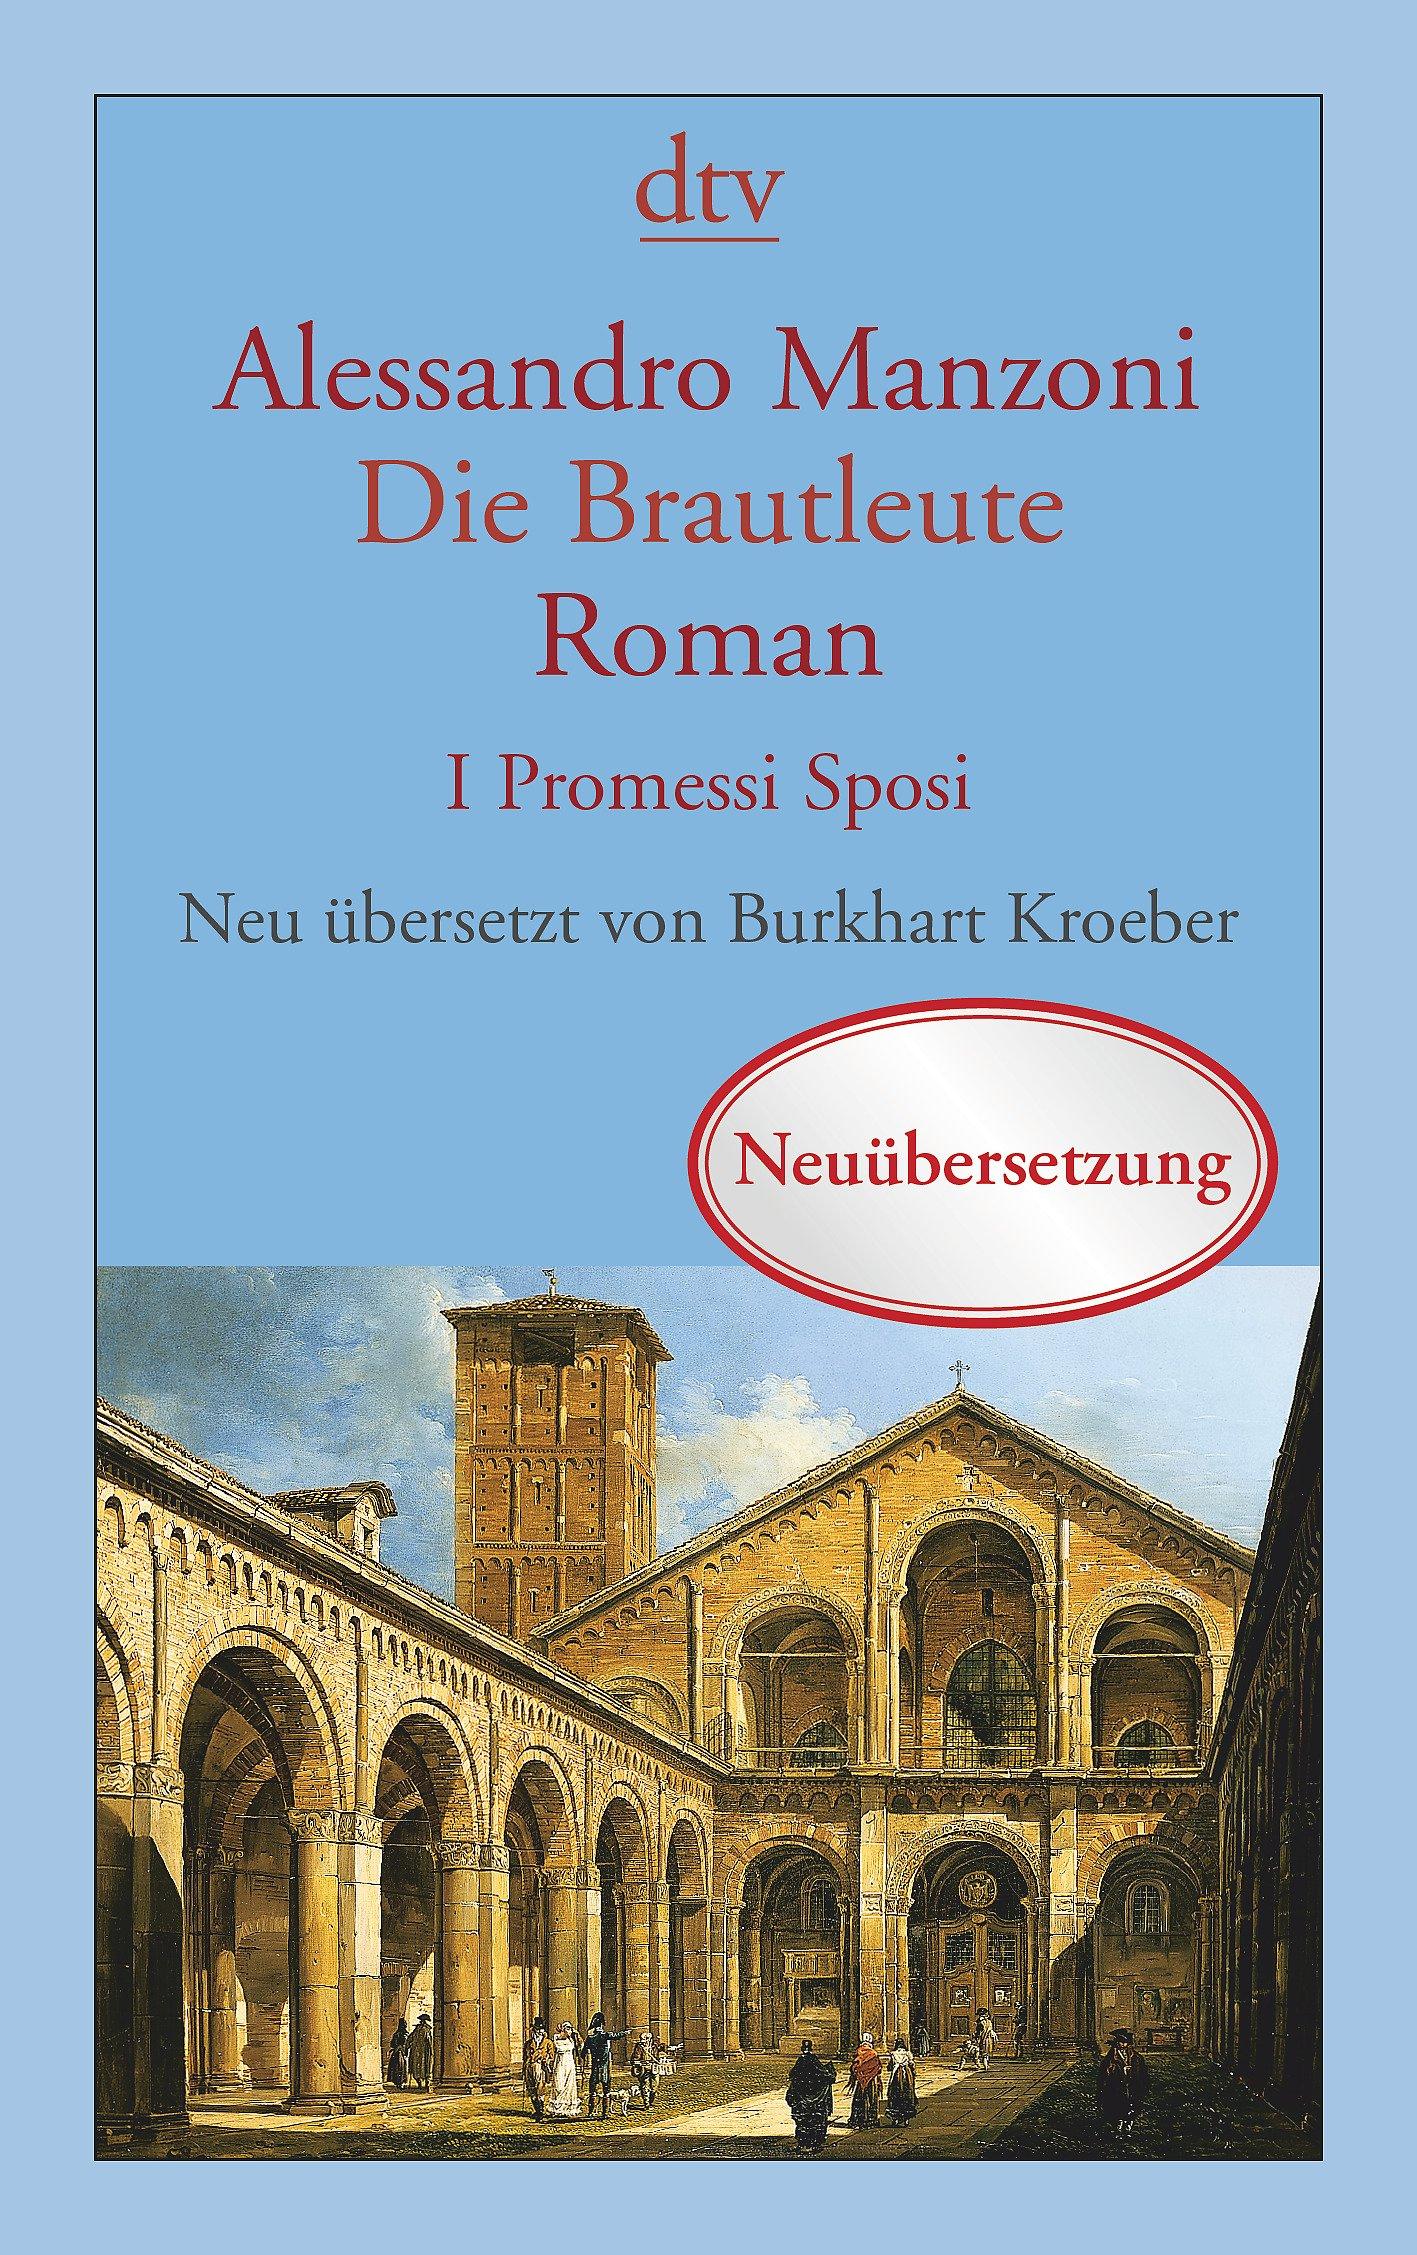 Die Brautleute: I Promessi Sposi Roman